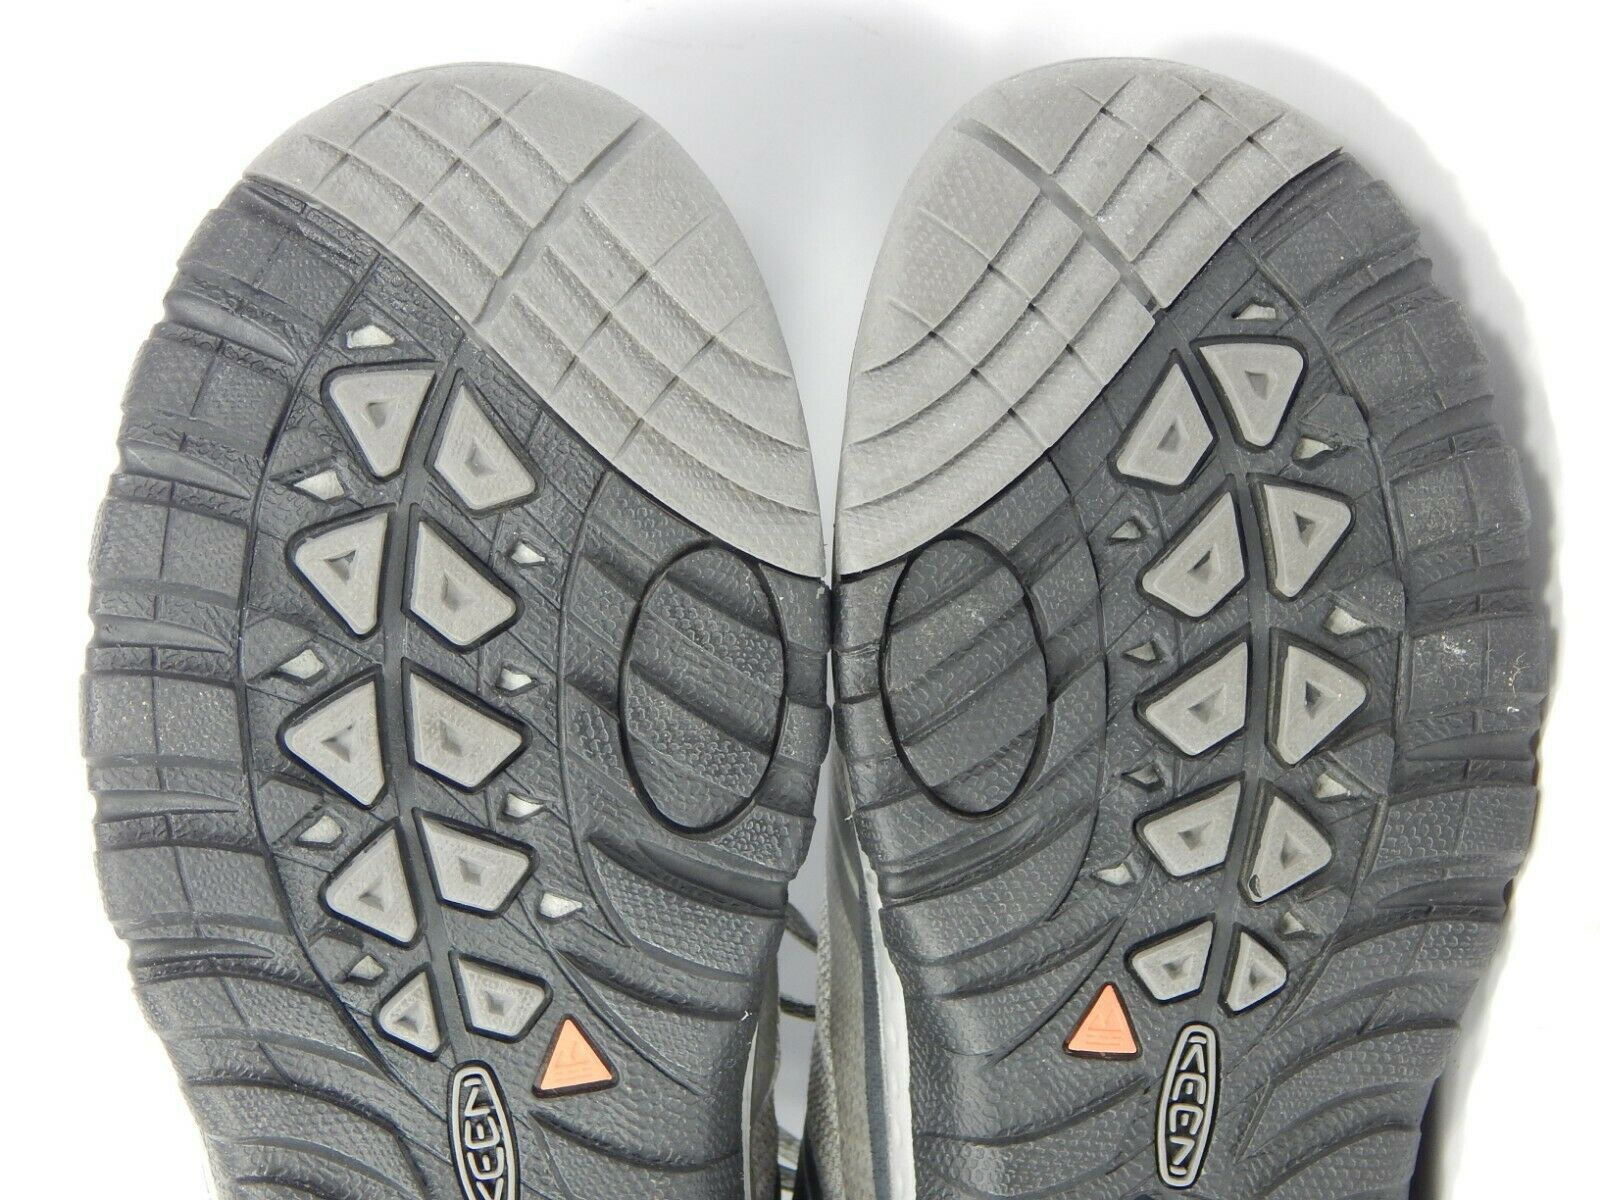 Keen Terradora Niedriges Top Größe 7,5 M (B) Eu 38 Damen Wp Wanderschuhe Grau